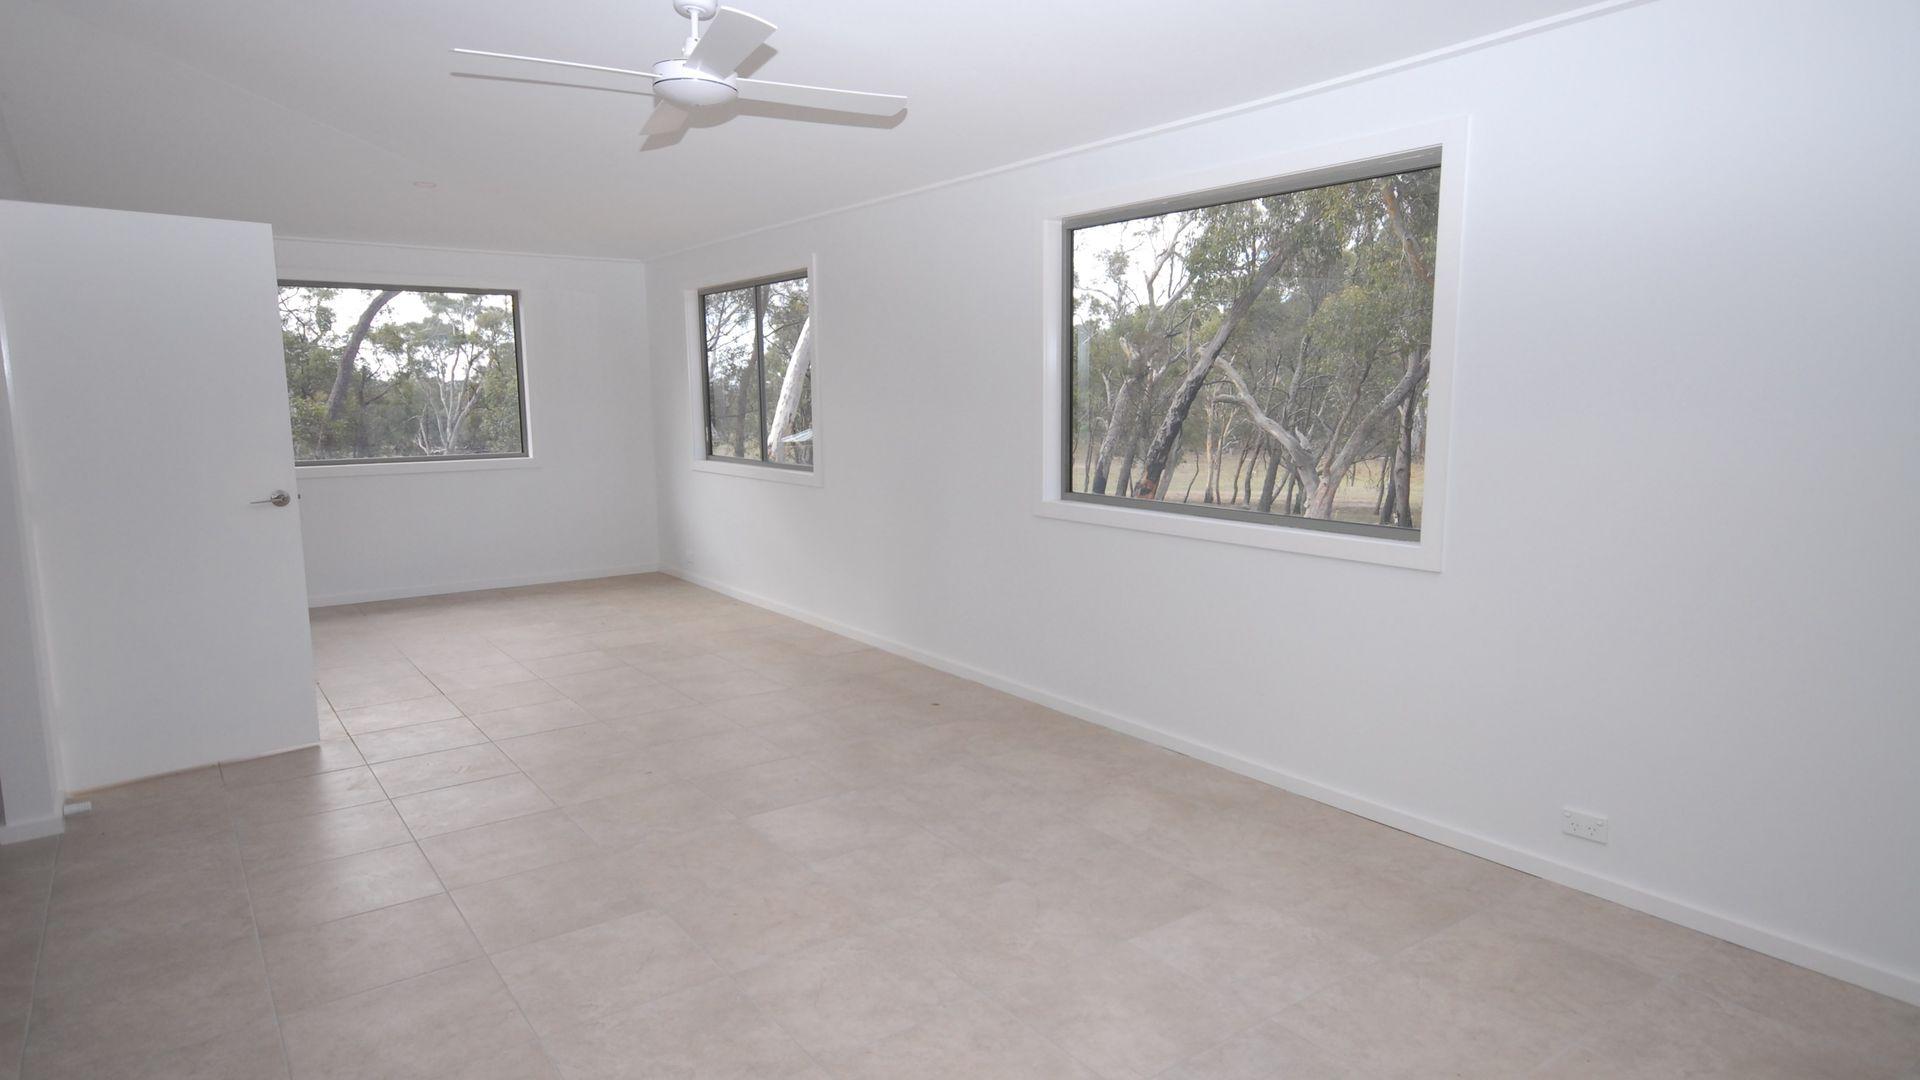 0000 Kings Highway, Bungendore NSW 2621, Image 2